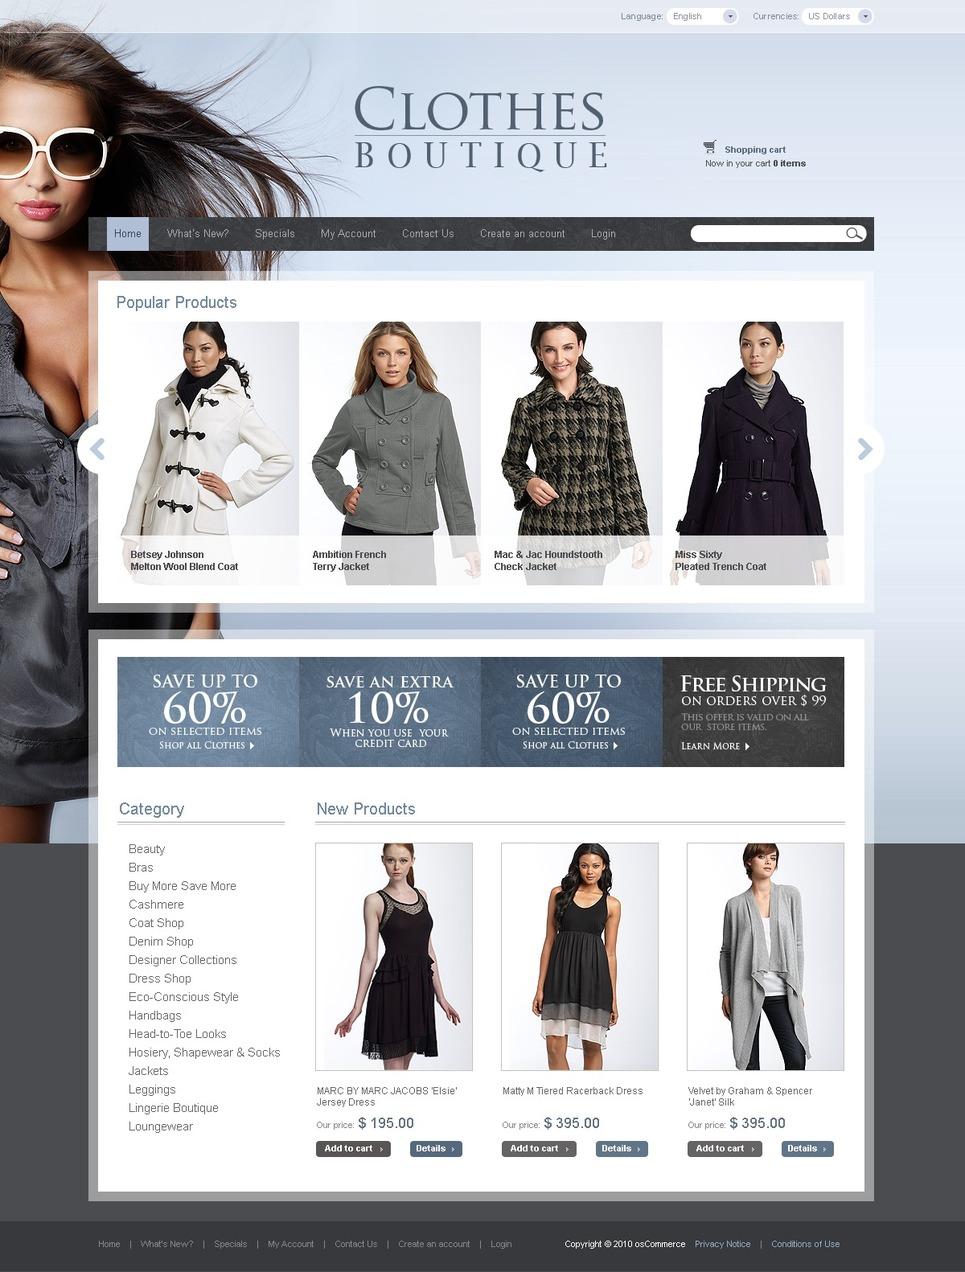 Iconic Clothes Boutique OSCommerce Web Store Theme